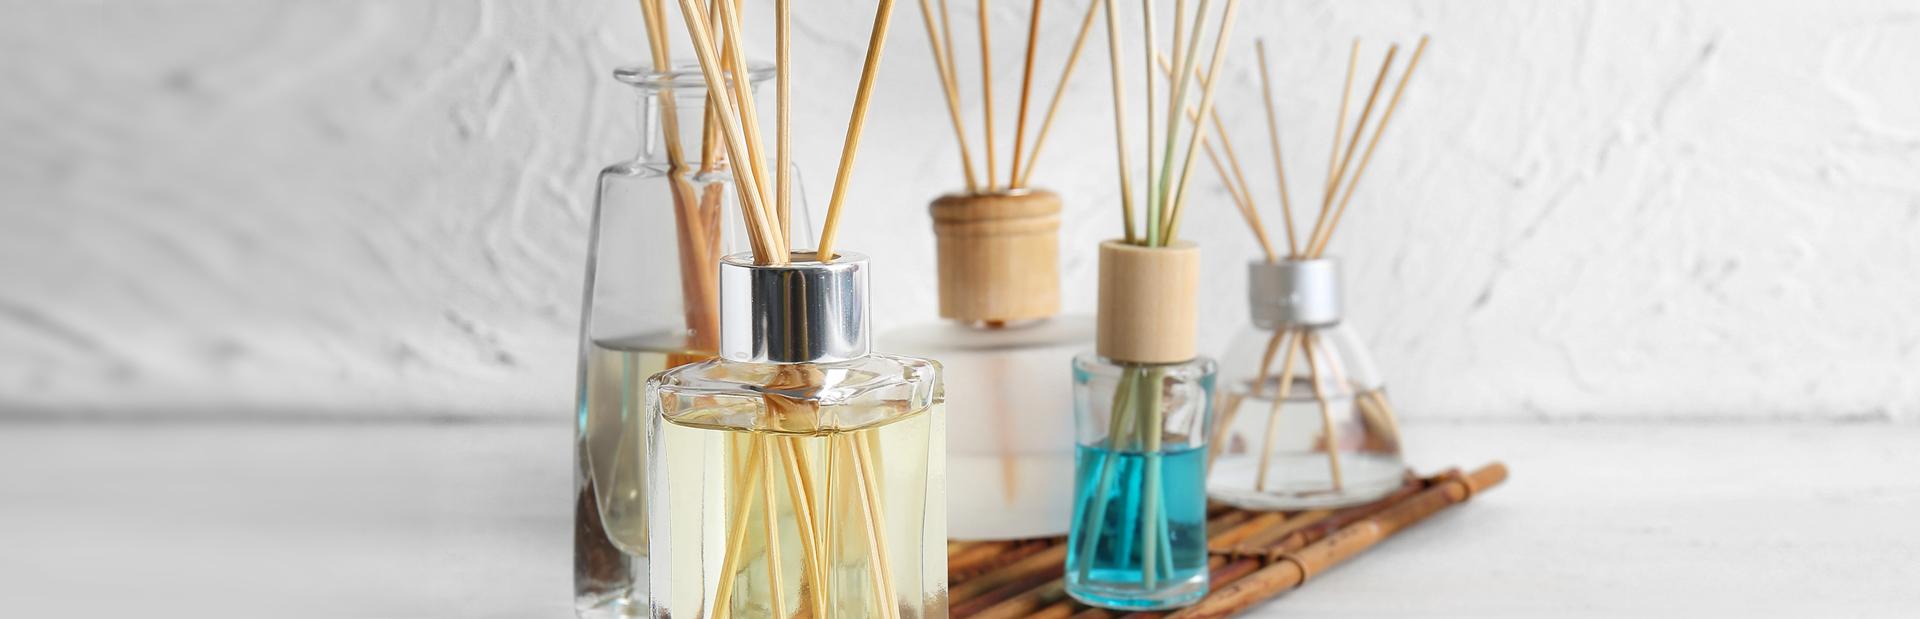 Sandri Group - produzione essenze profumate, candele, plastica profumata conto terzi